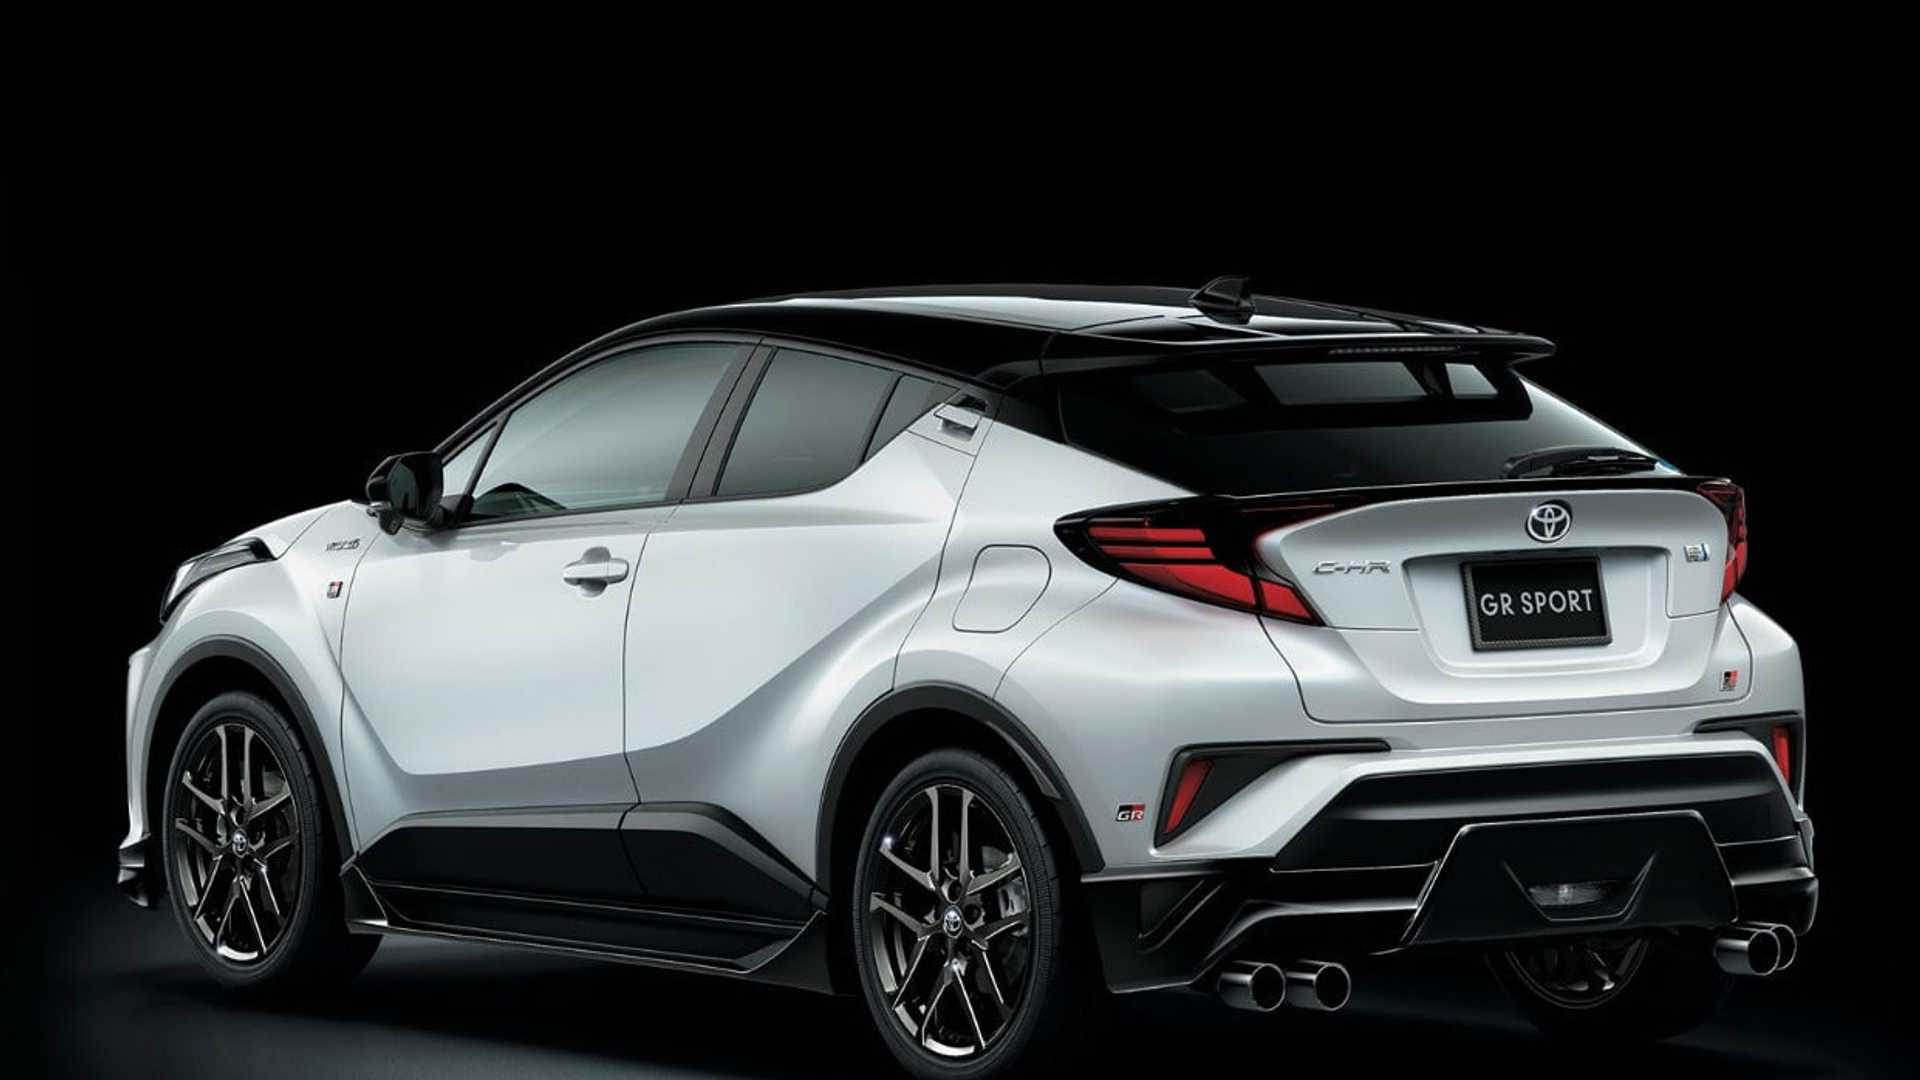 Toyota-C-HR-GR-Sport-by-Gazoo-Racing-21